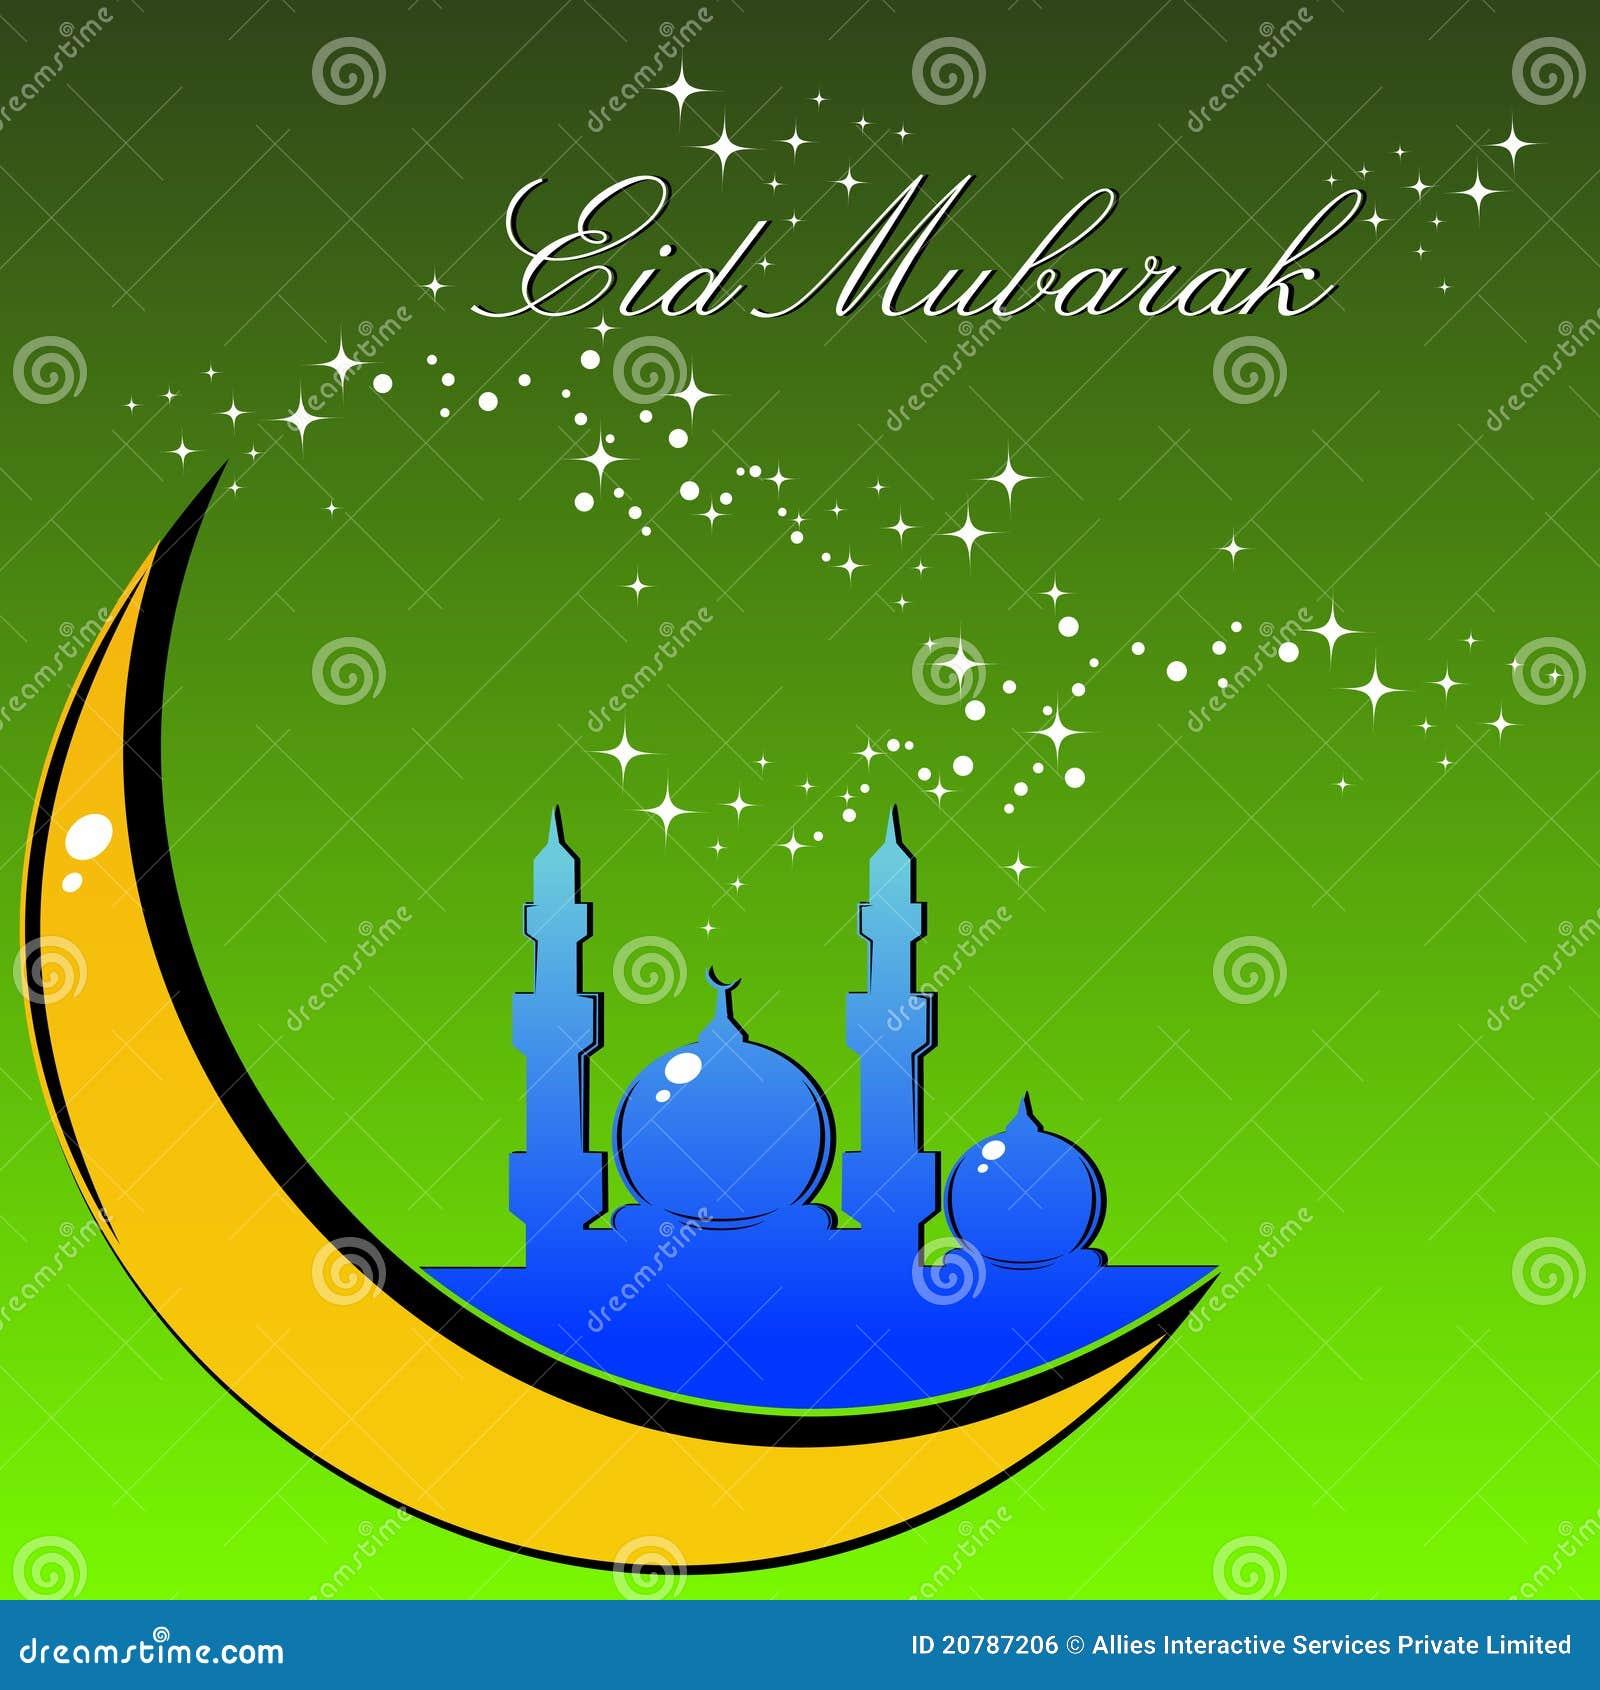 Vector Eid Celebration Illustration Royalty Free Stock ...